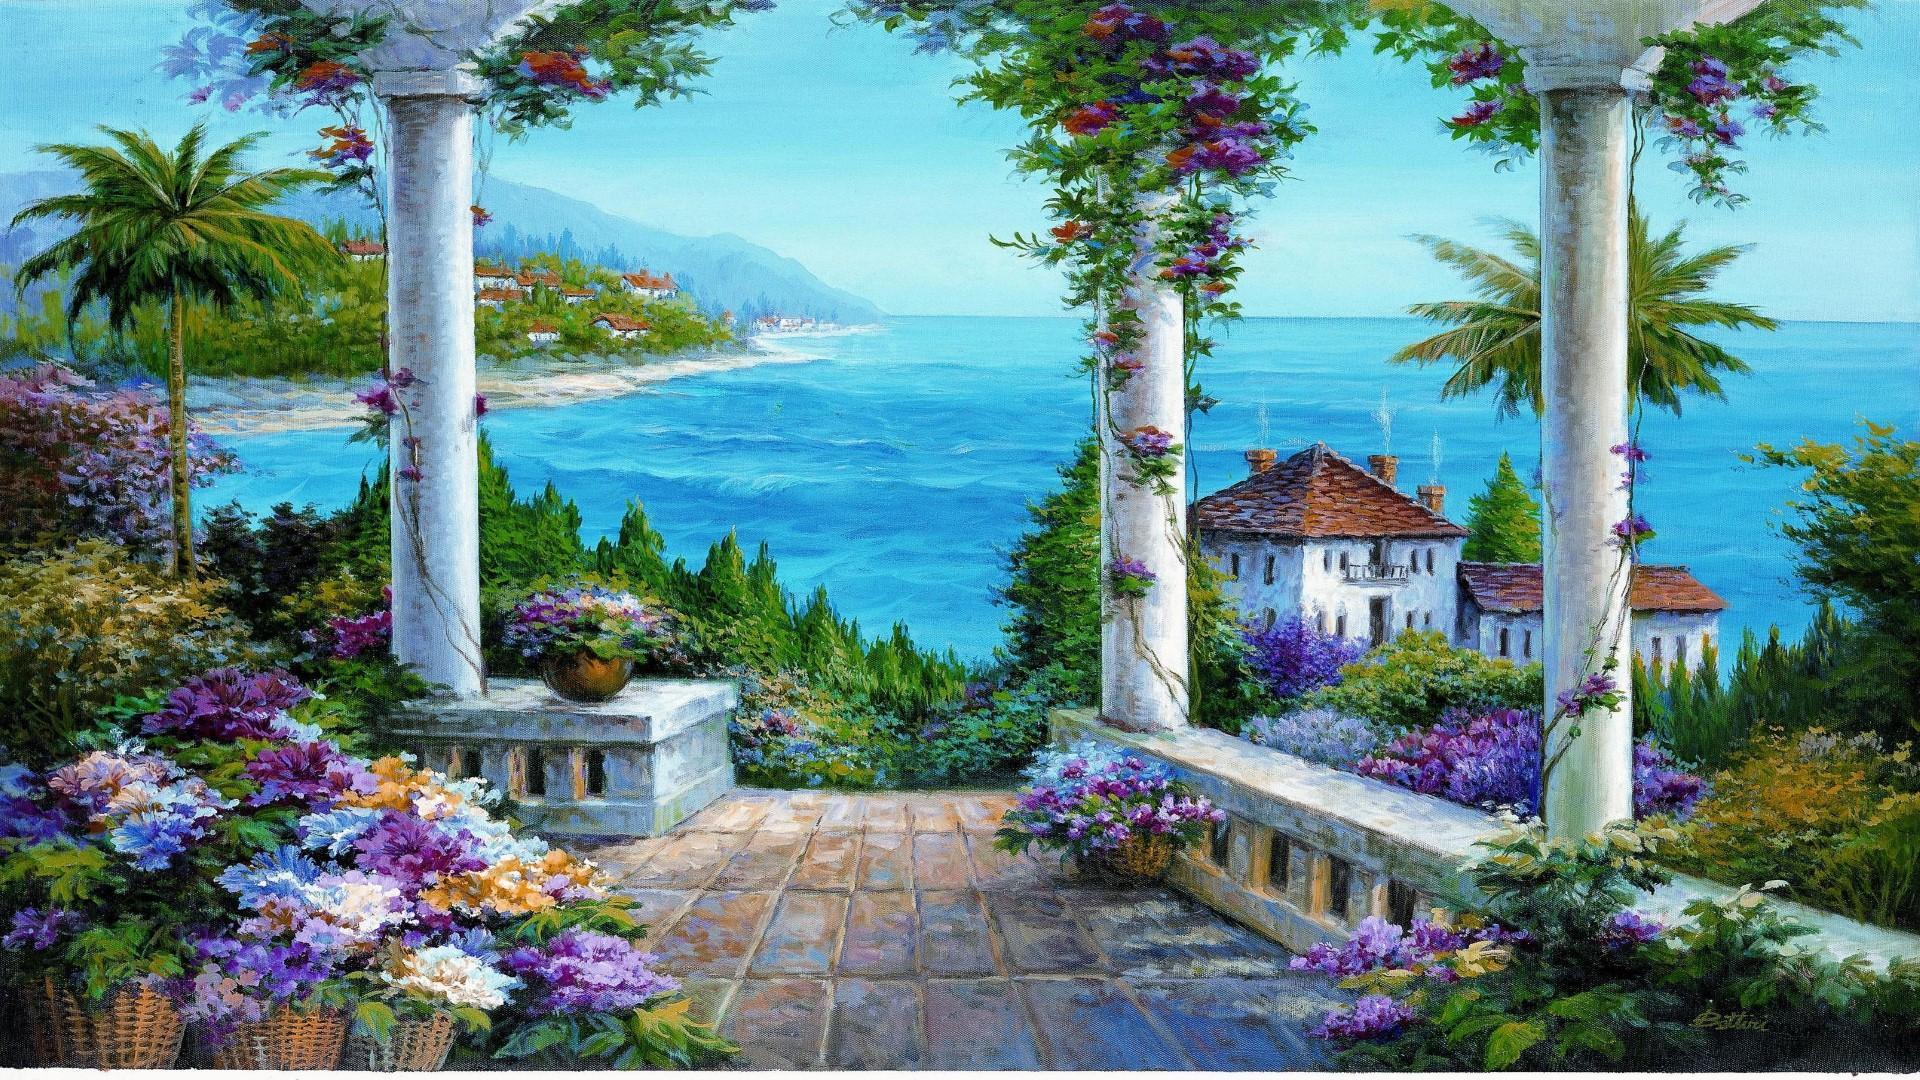 Beautiful View Hd Wallpaper Background Image 1920x1080 Id